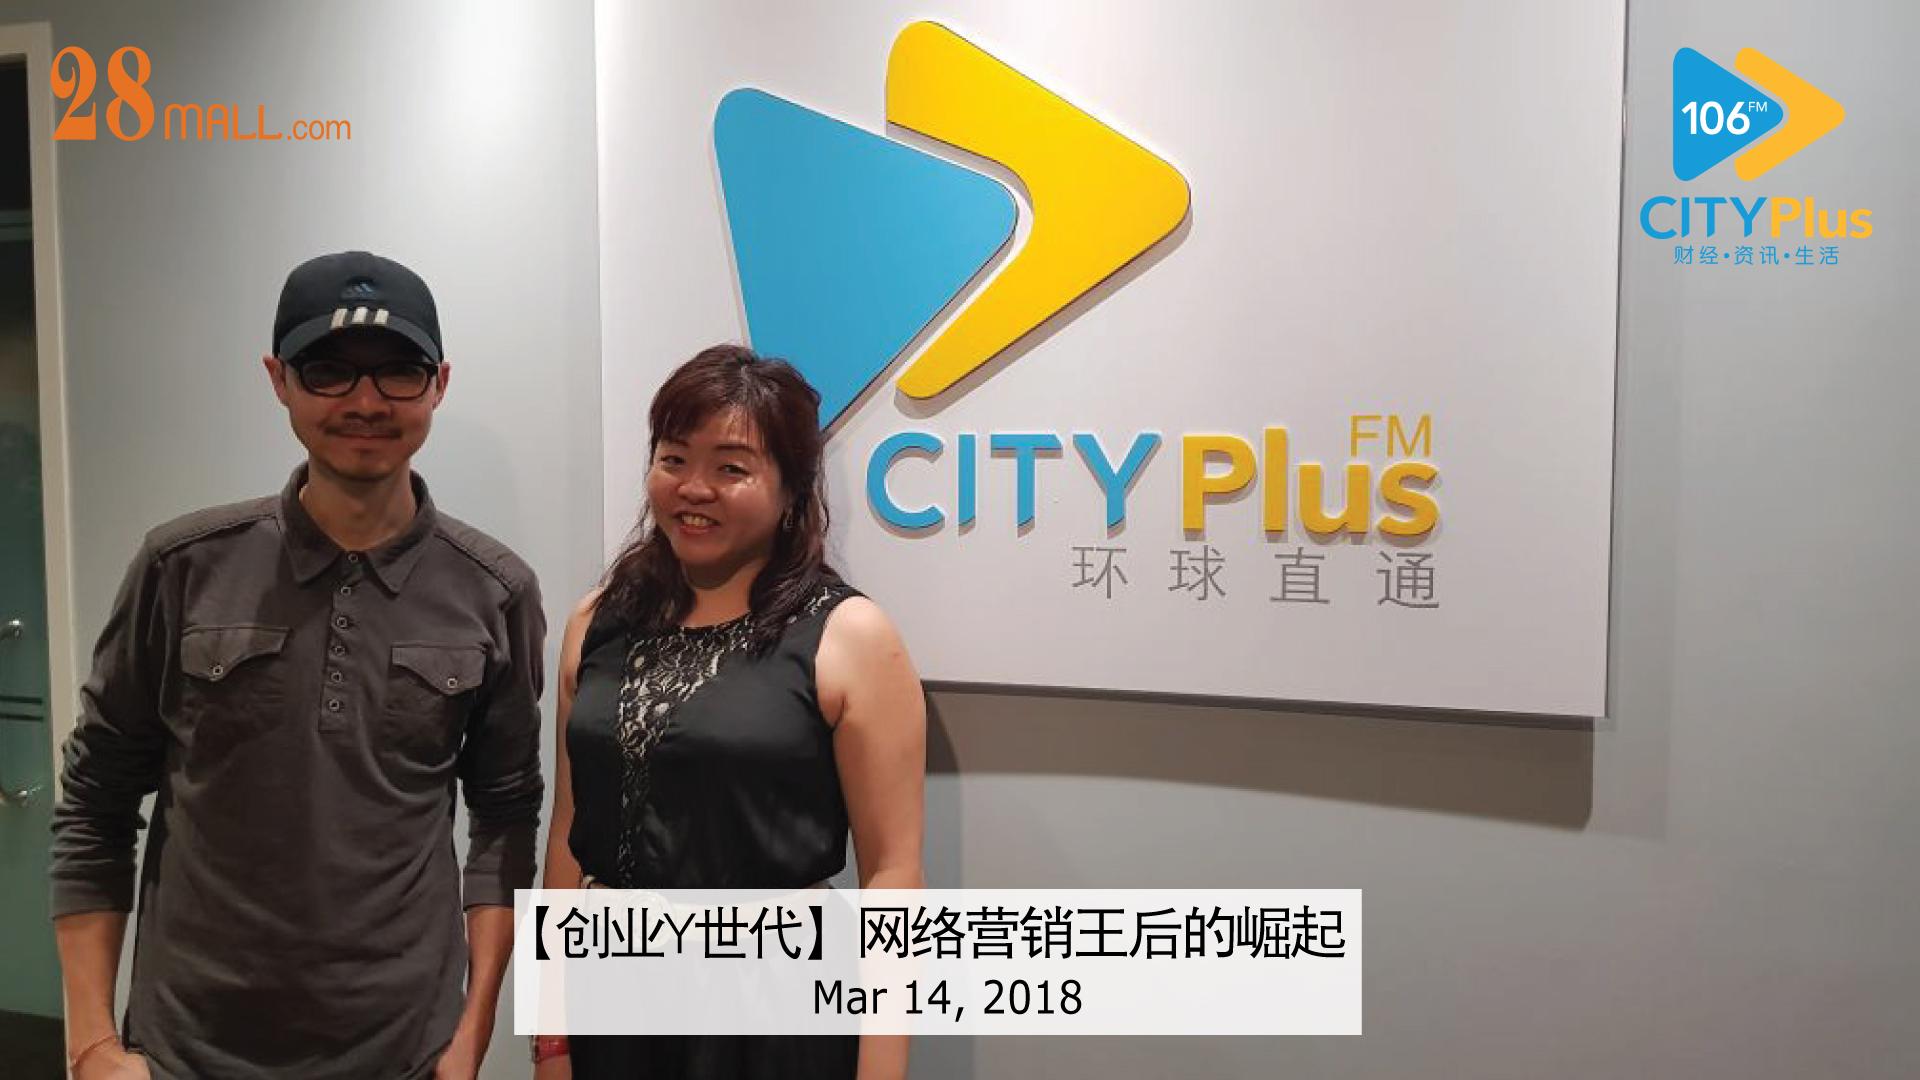 【创业Y世代】网络营销王后的崛起 Conversation Personality interview at CITYPlus FM